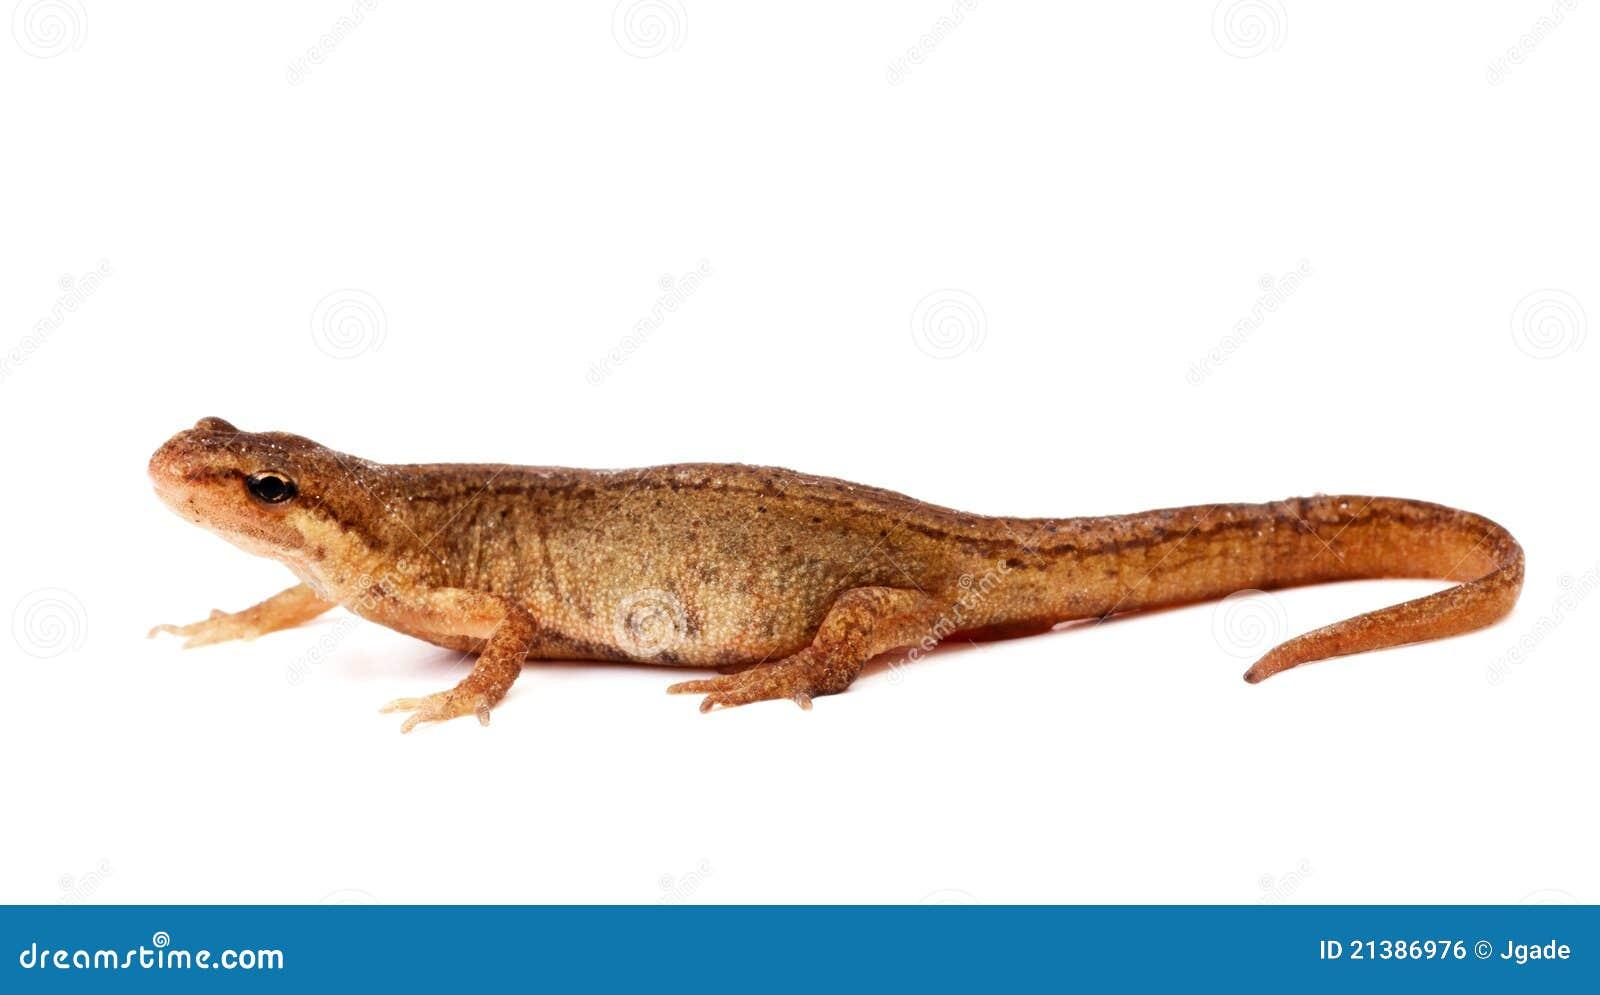 salamander white background - photo #6